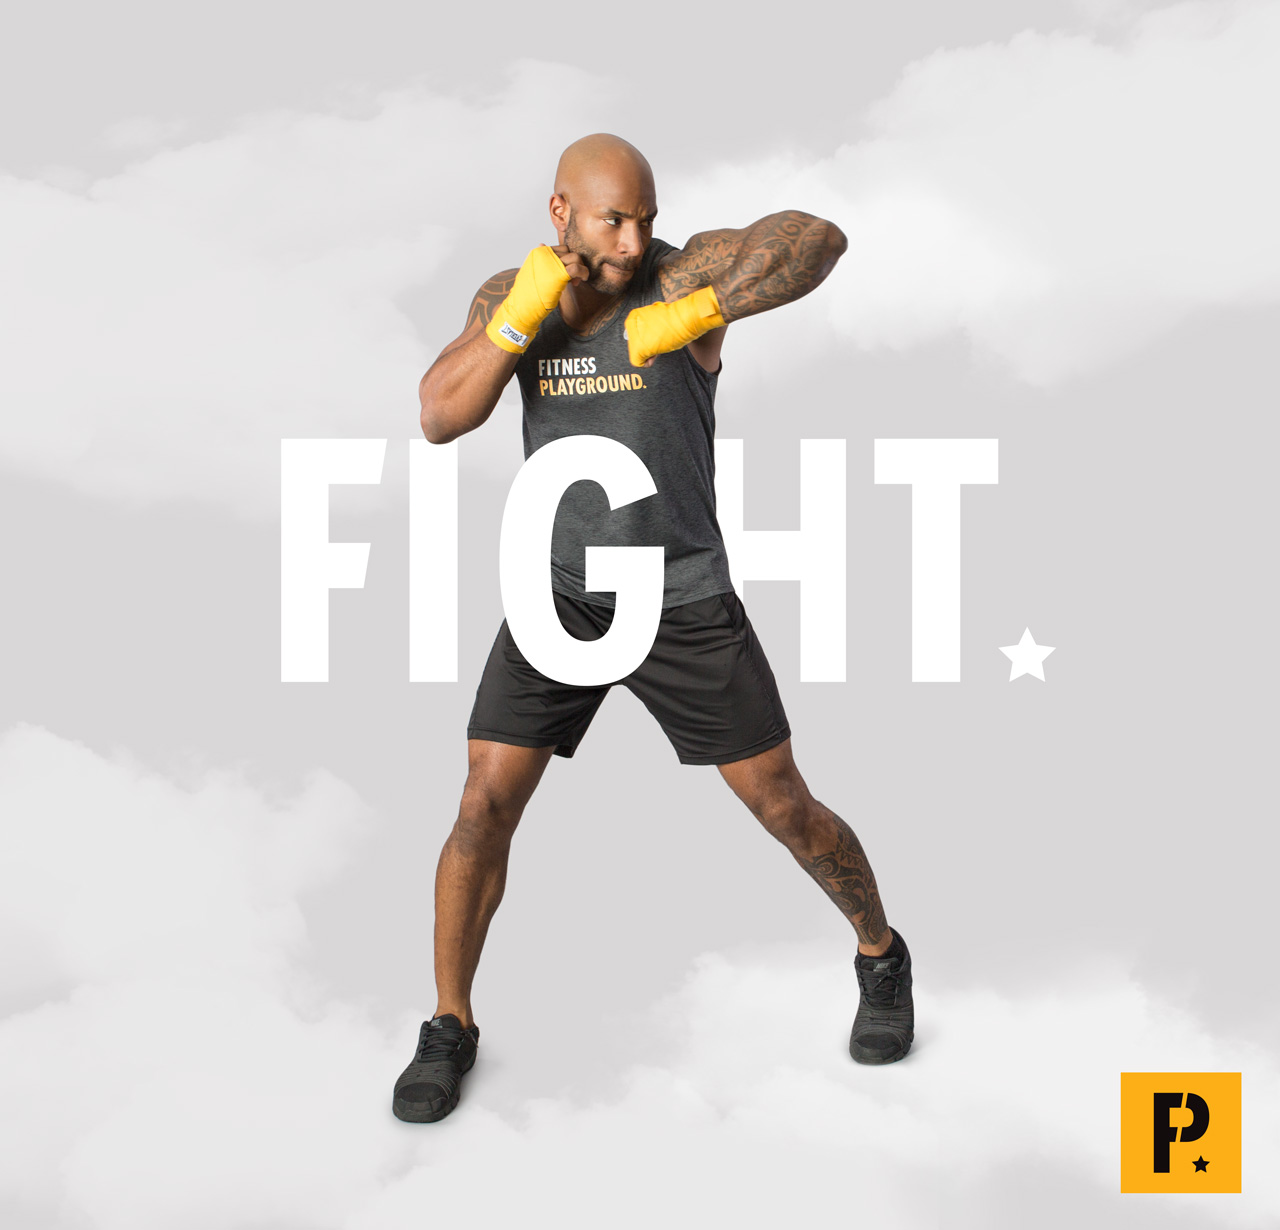 170823_FPD_Campaign_FIGHT_v1.0.jpg